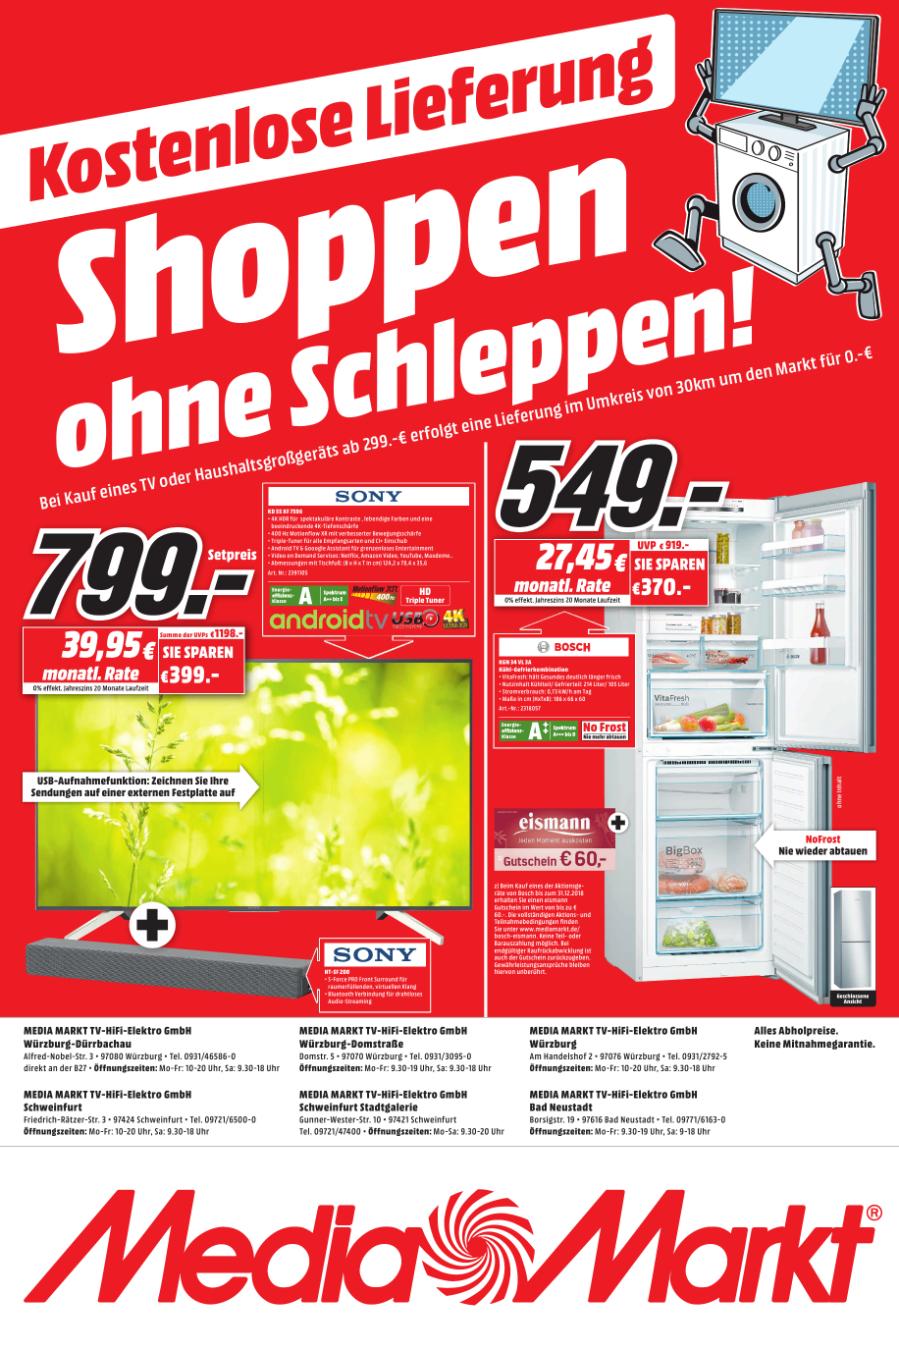 [Lokal MM WÜ+Schweinfurt] SONY KD-XF7596 + Soundbar HT-SF 200 Gratis Lieferung bis 30km